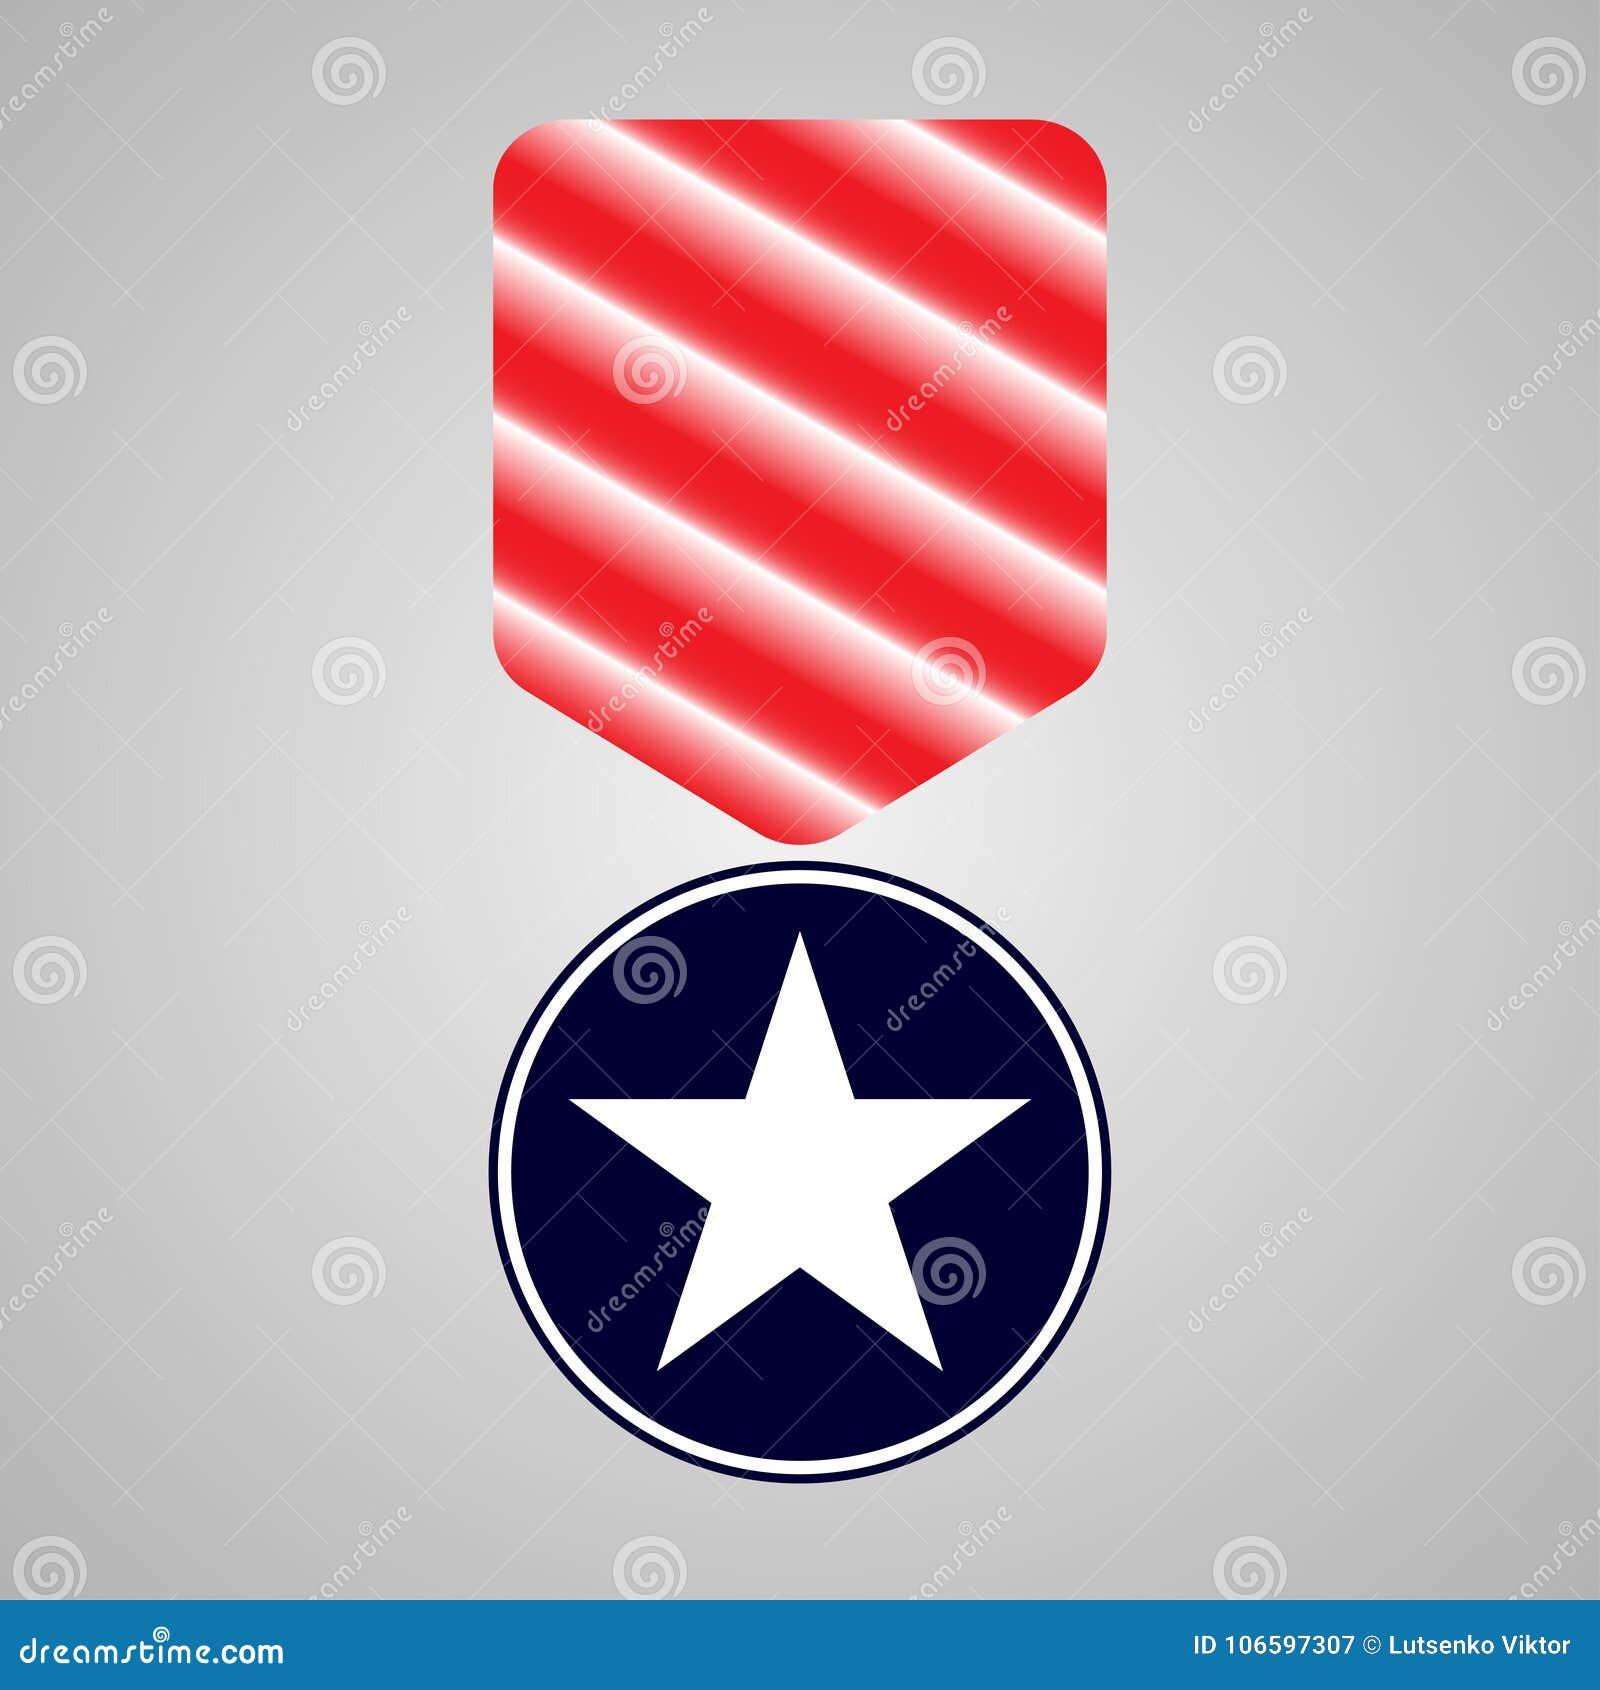 Militarny medal Weterana dzień